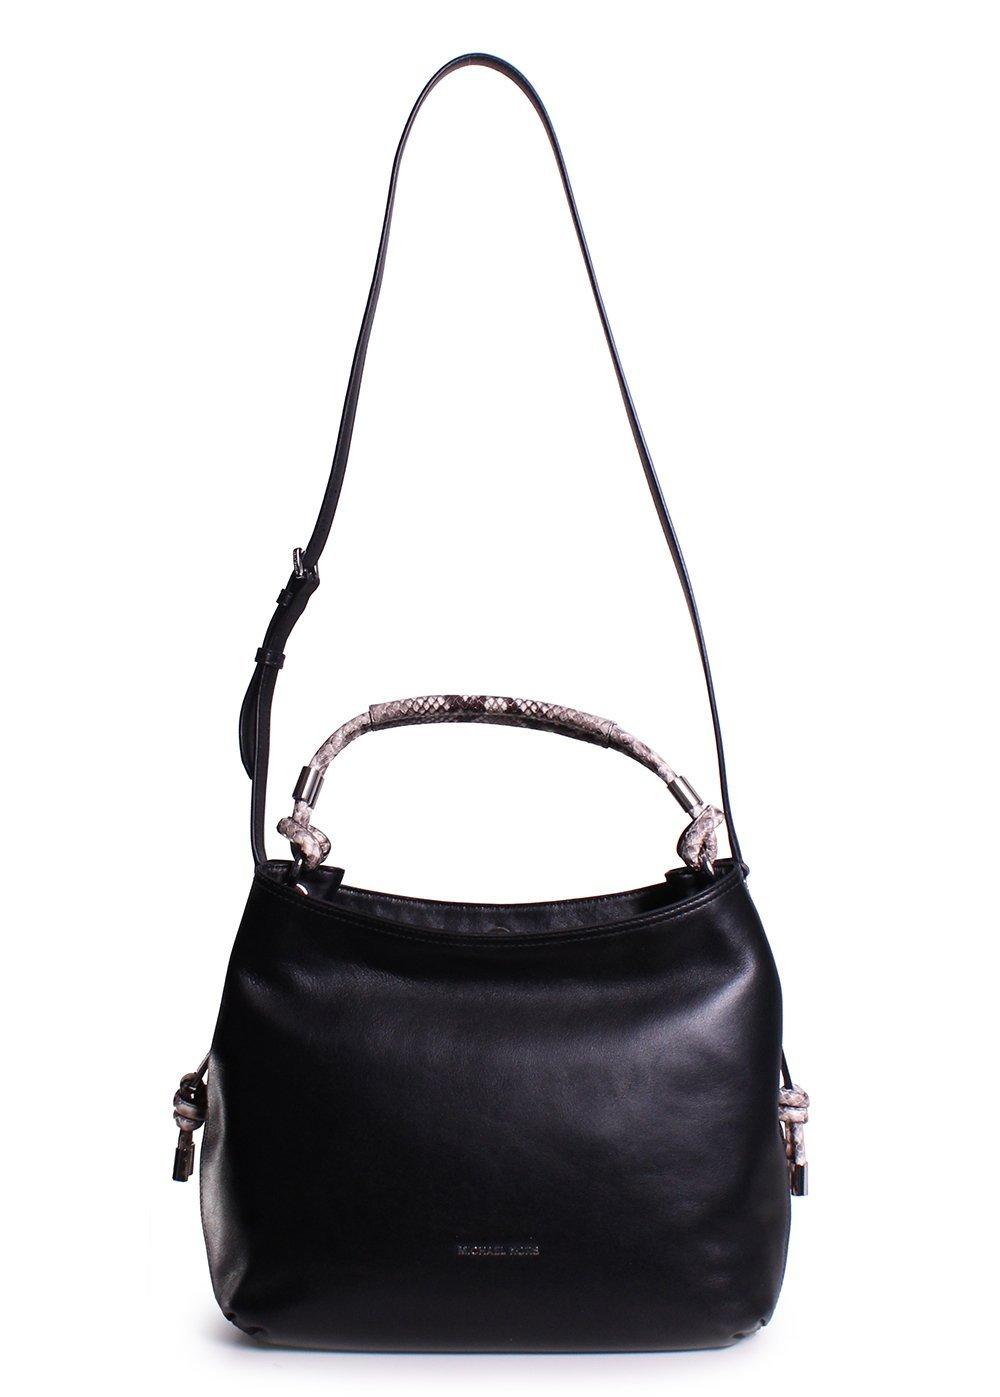 3367b3b55fe8 ... Michael Kors Isabel Large Convertible Shoulder Bag in Black